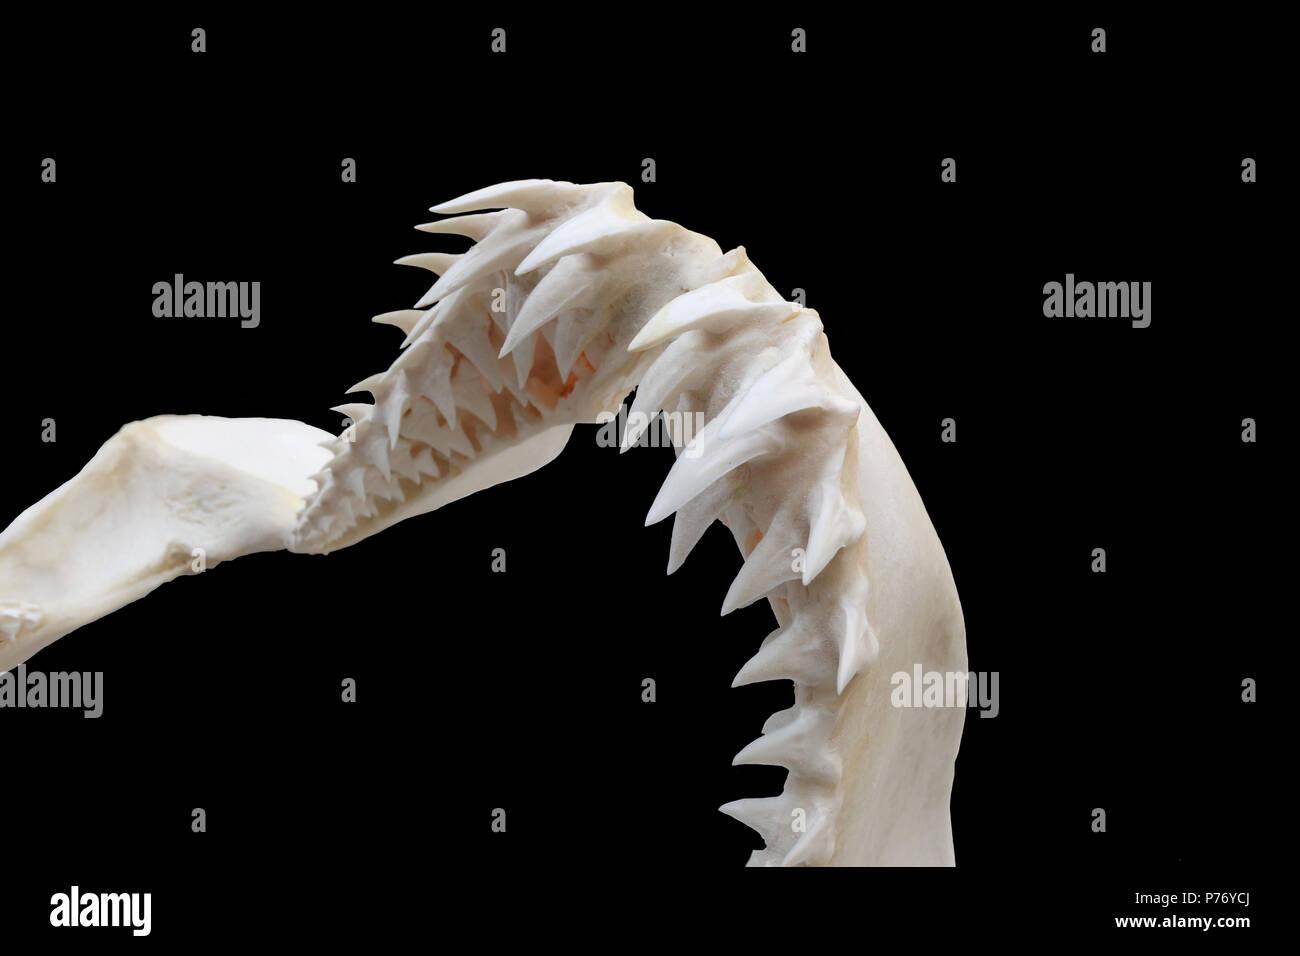 Shortfin Mako Shark (Isurus oxyrinchus) Upper Jaw - Stock Image